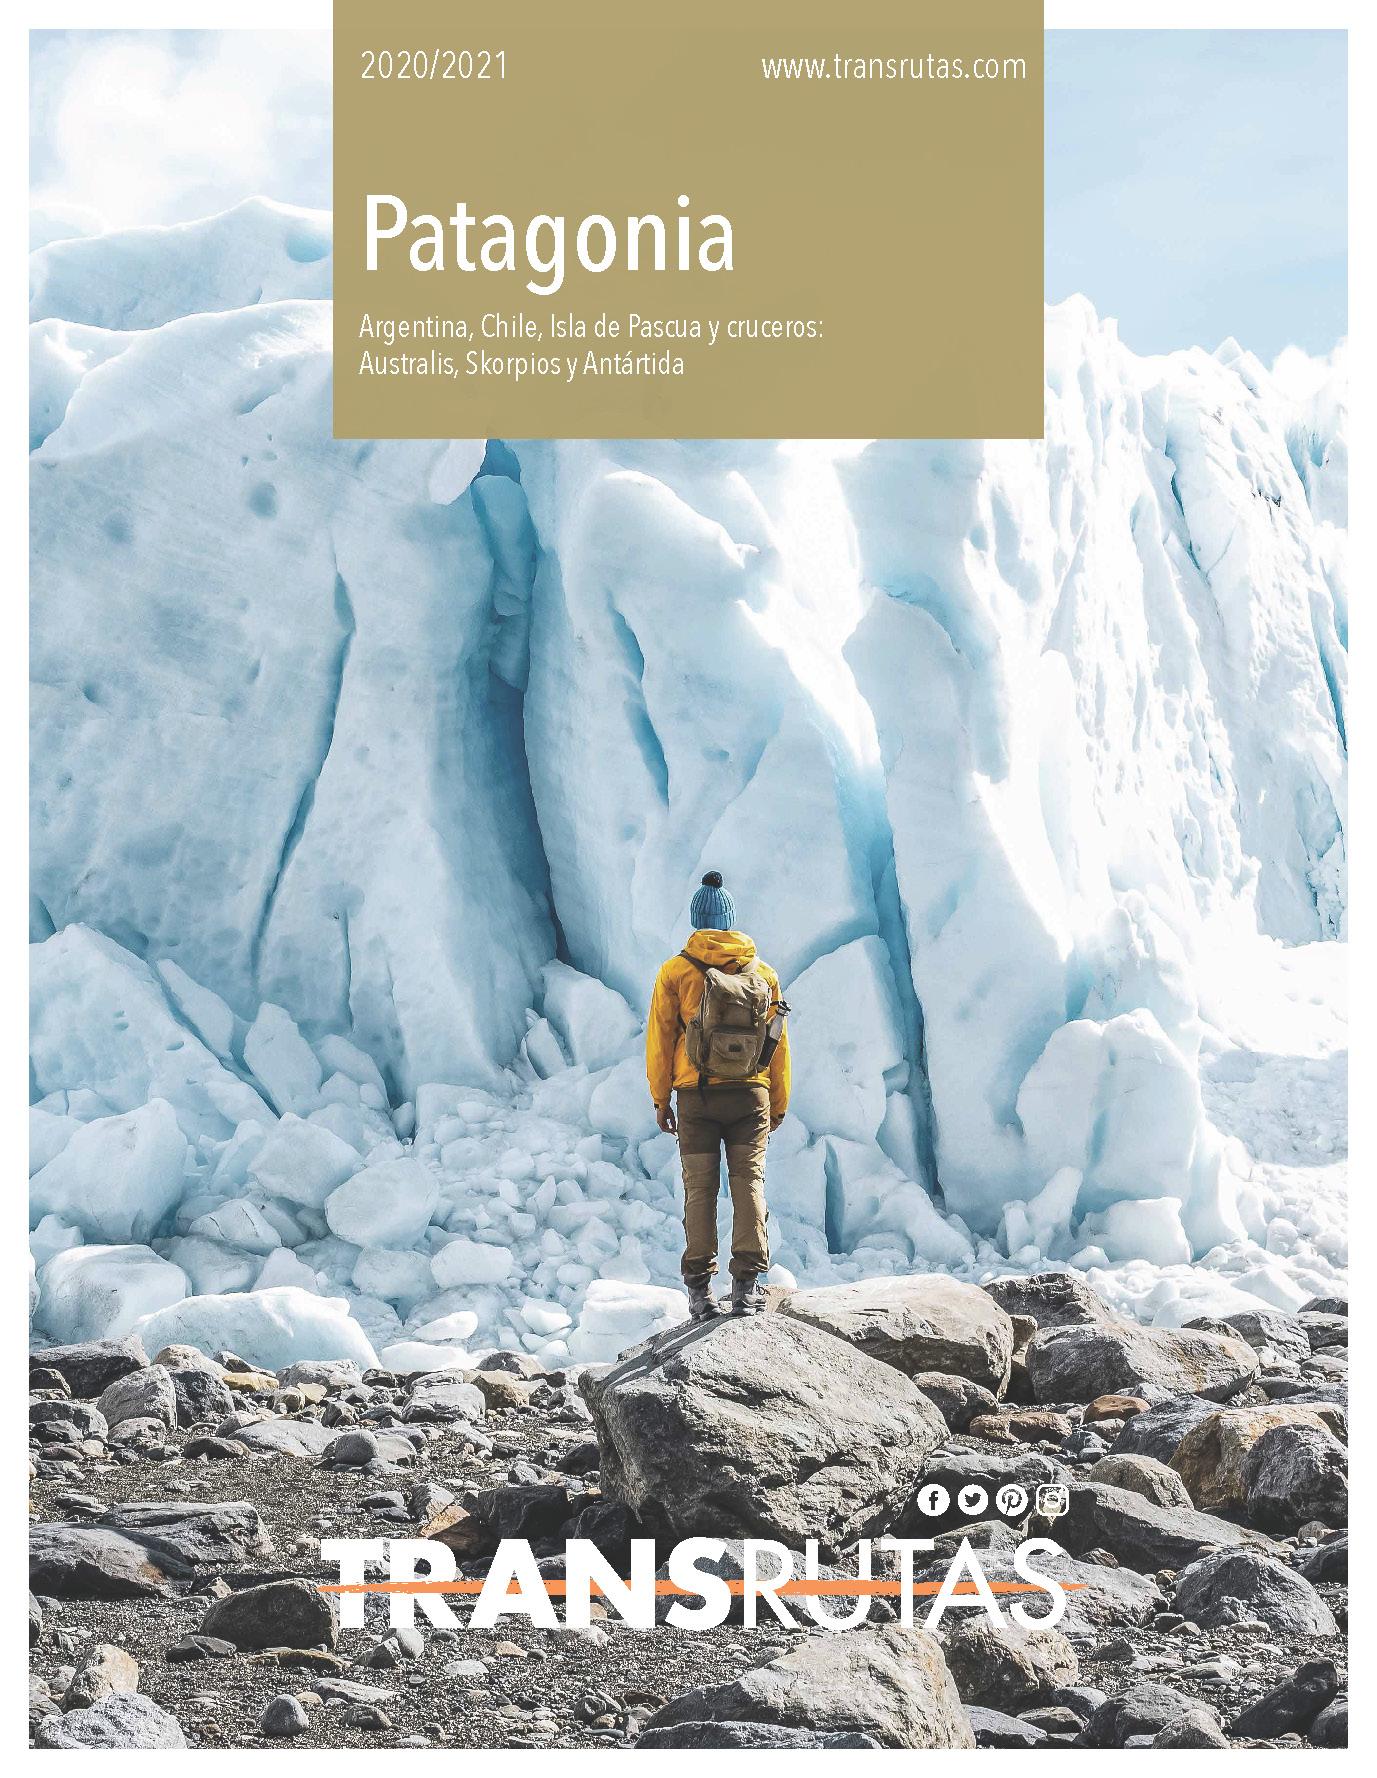 Catalogo Transrutas Patagonia 2020-2021